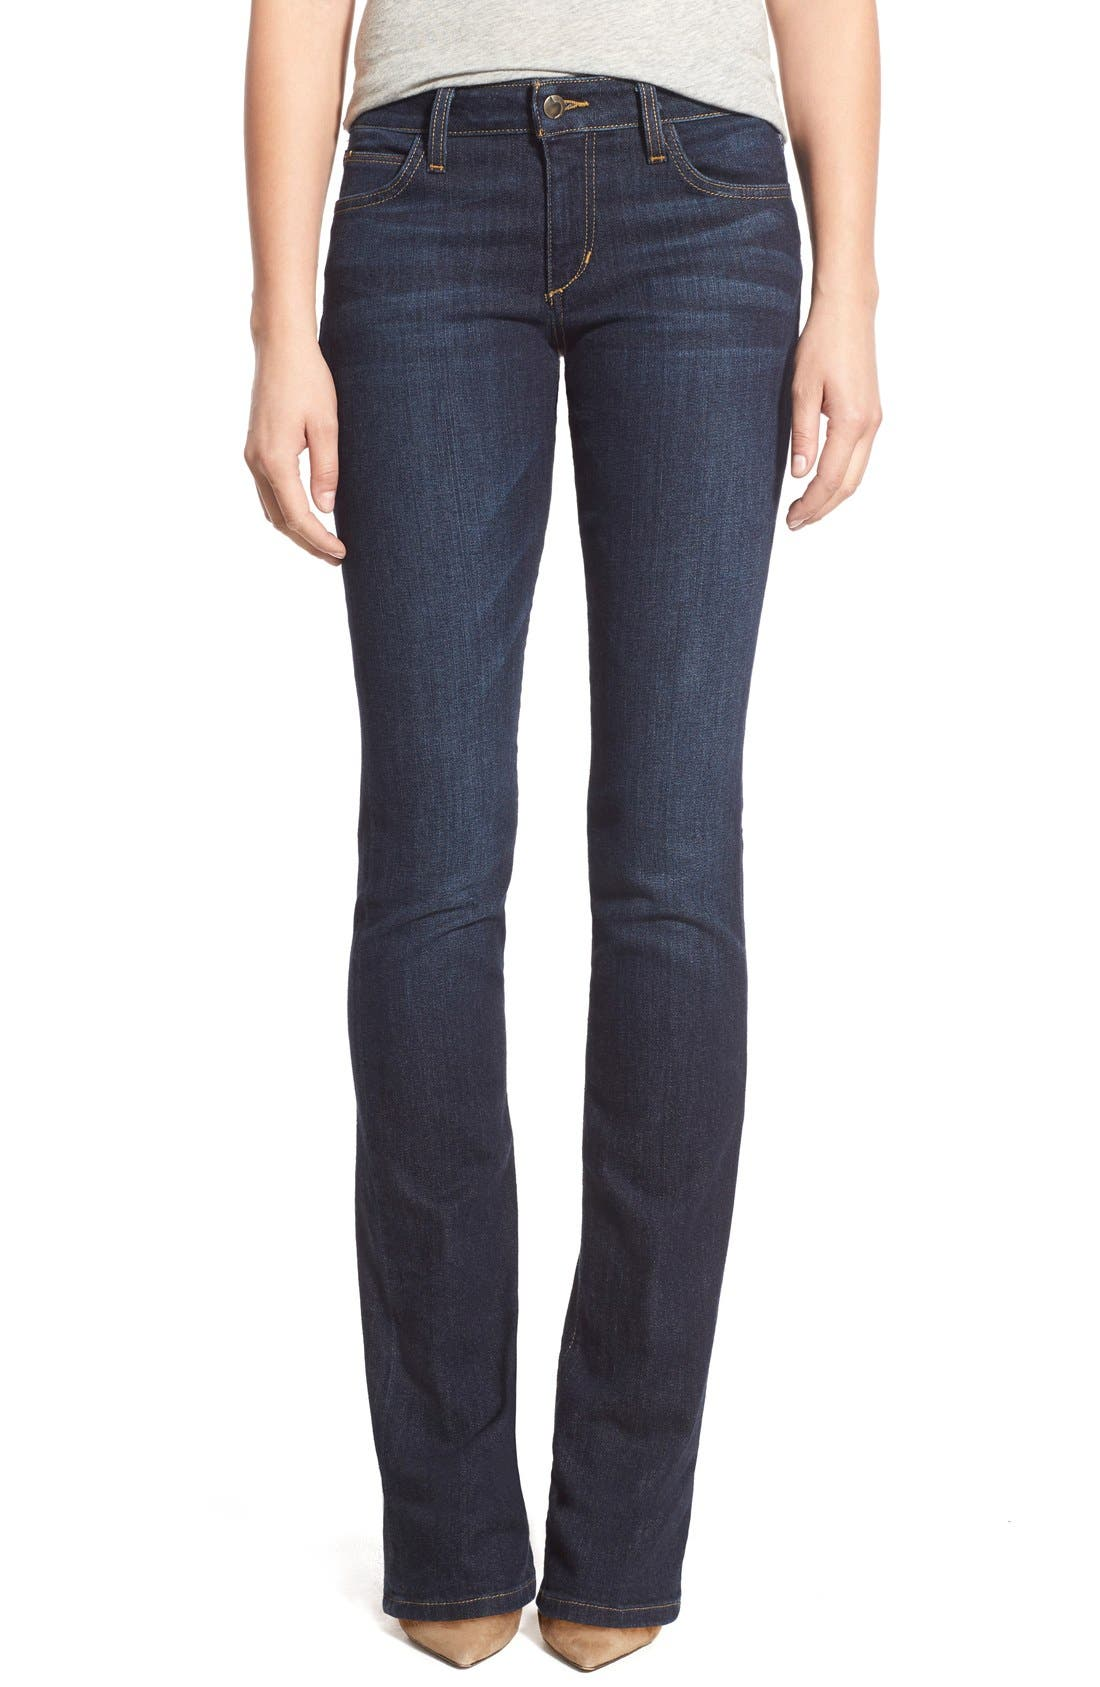 Honey Curvy Bootcut Jeans,                         Main,                         color, Rikki